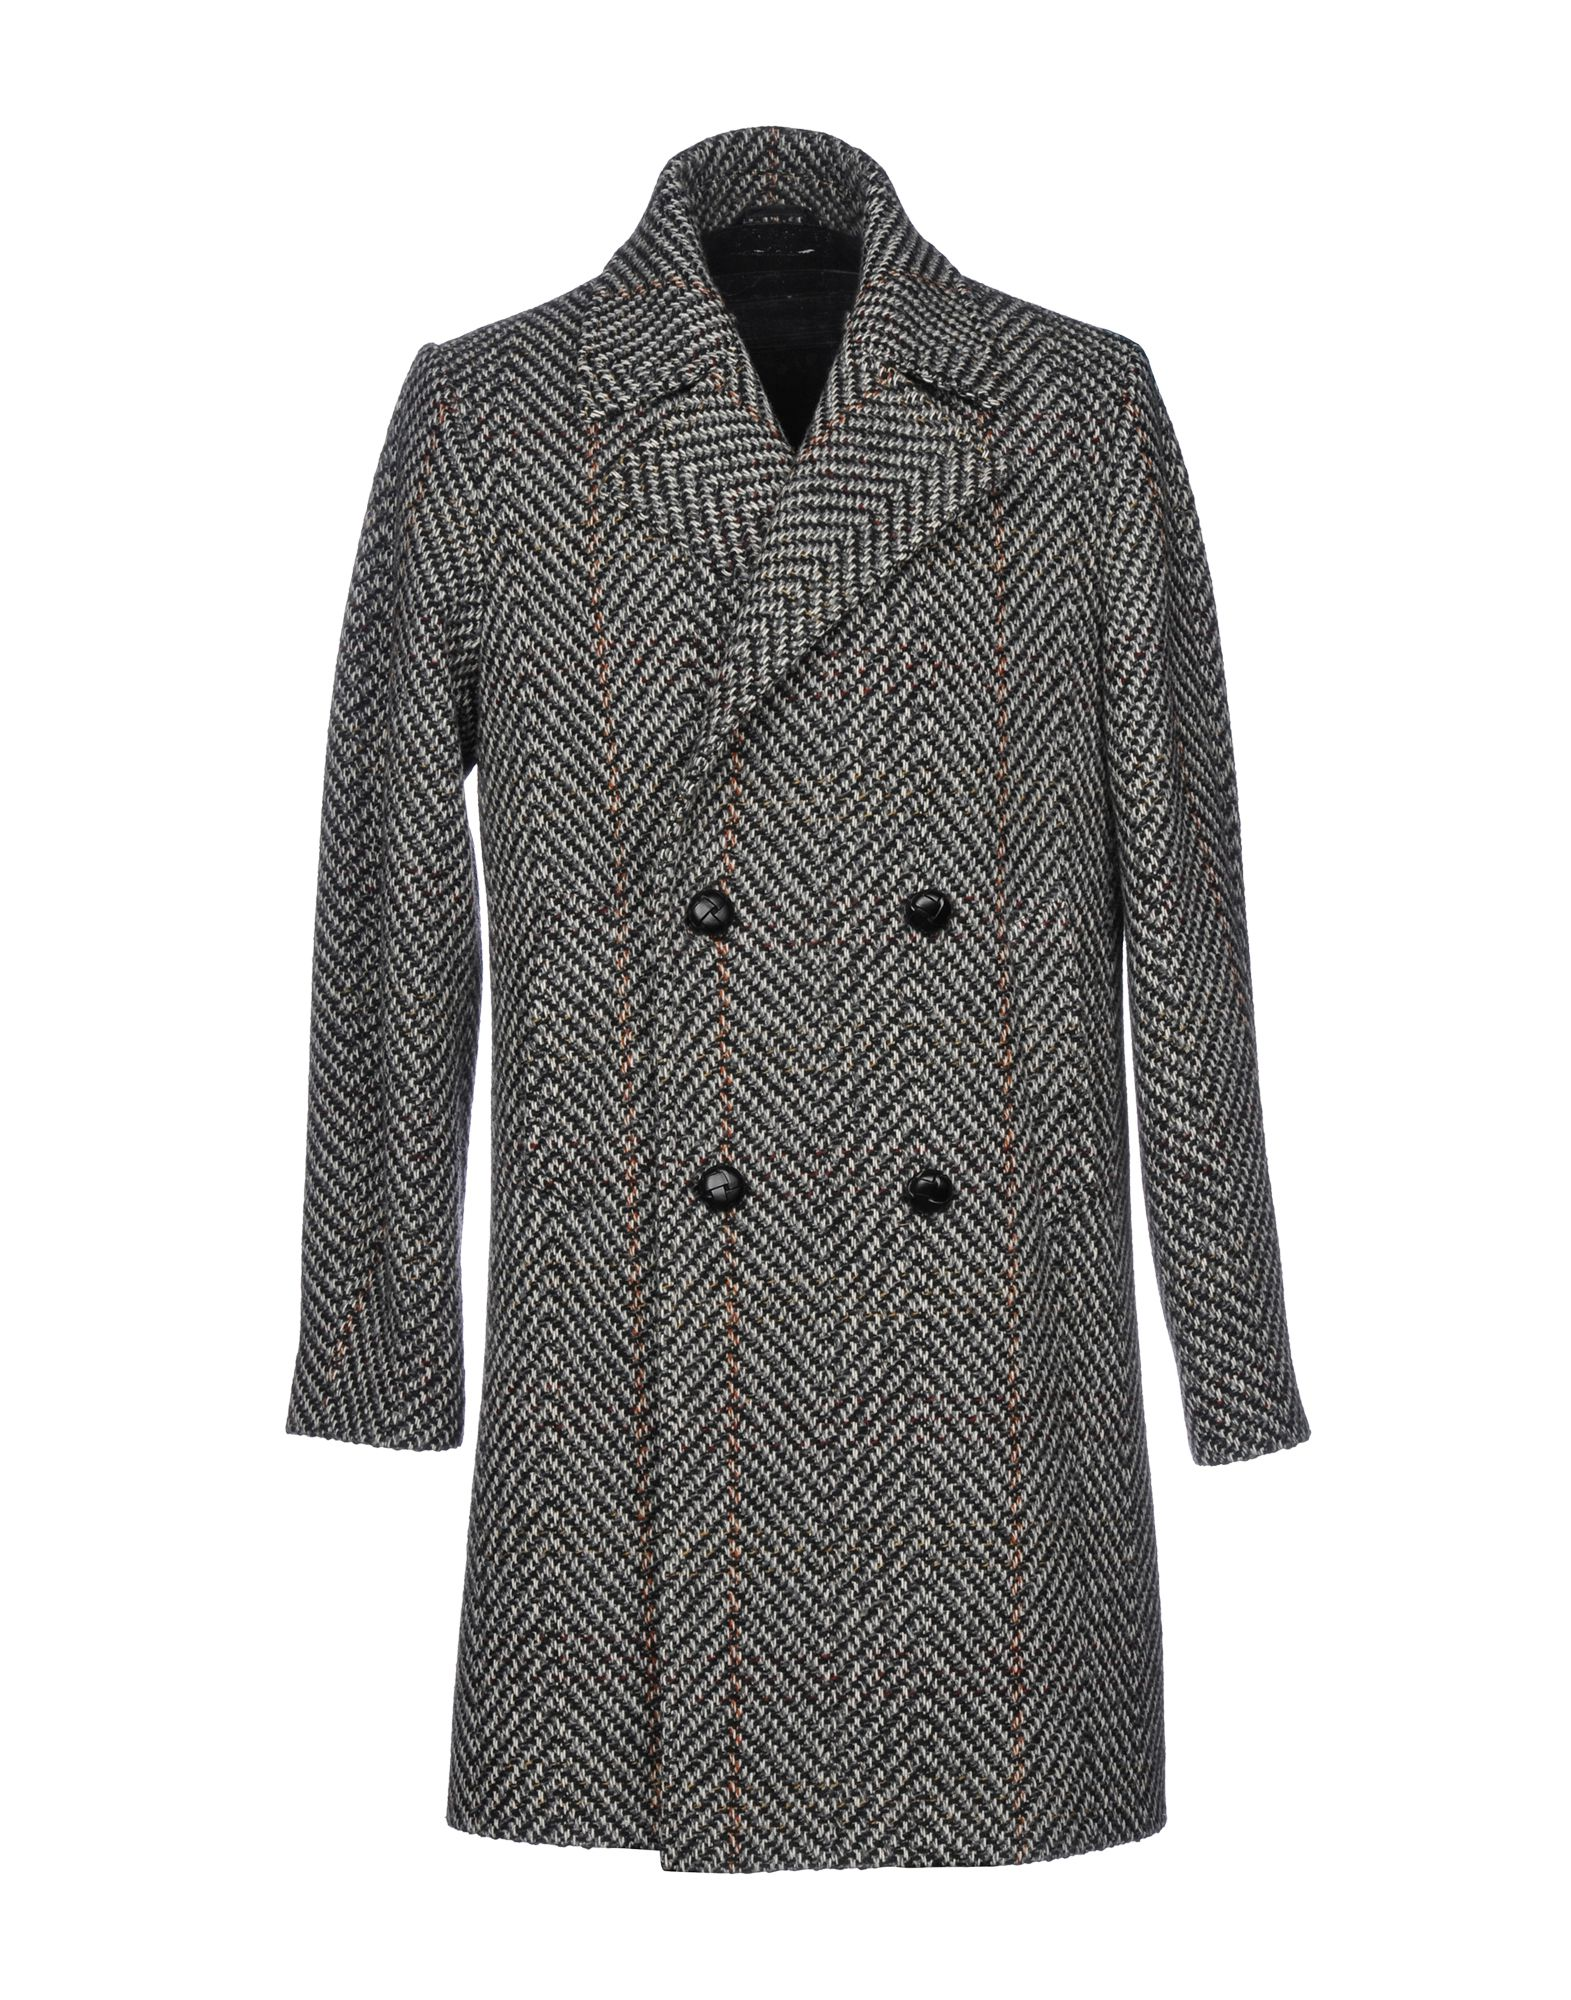 DOPPIAA Herringbone Double Brested Coat in Grey